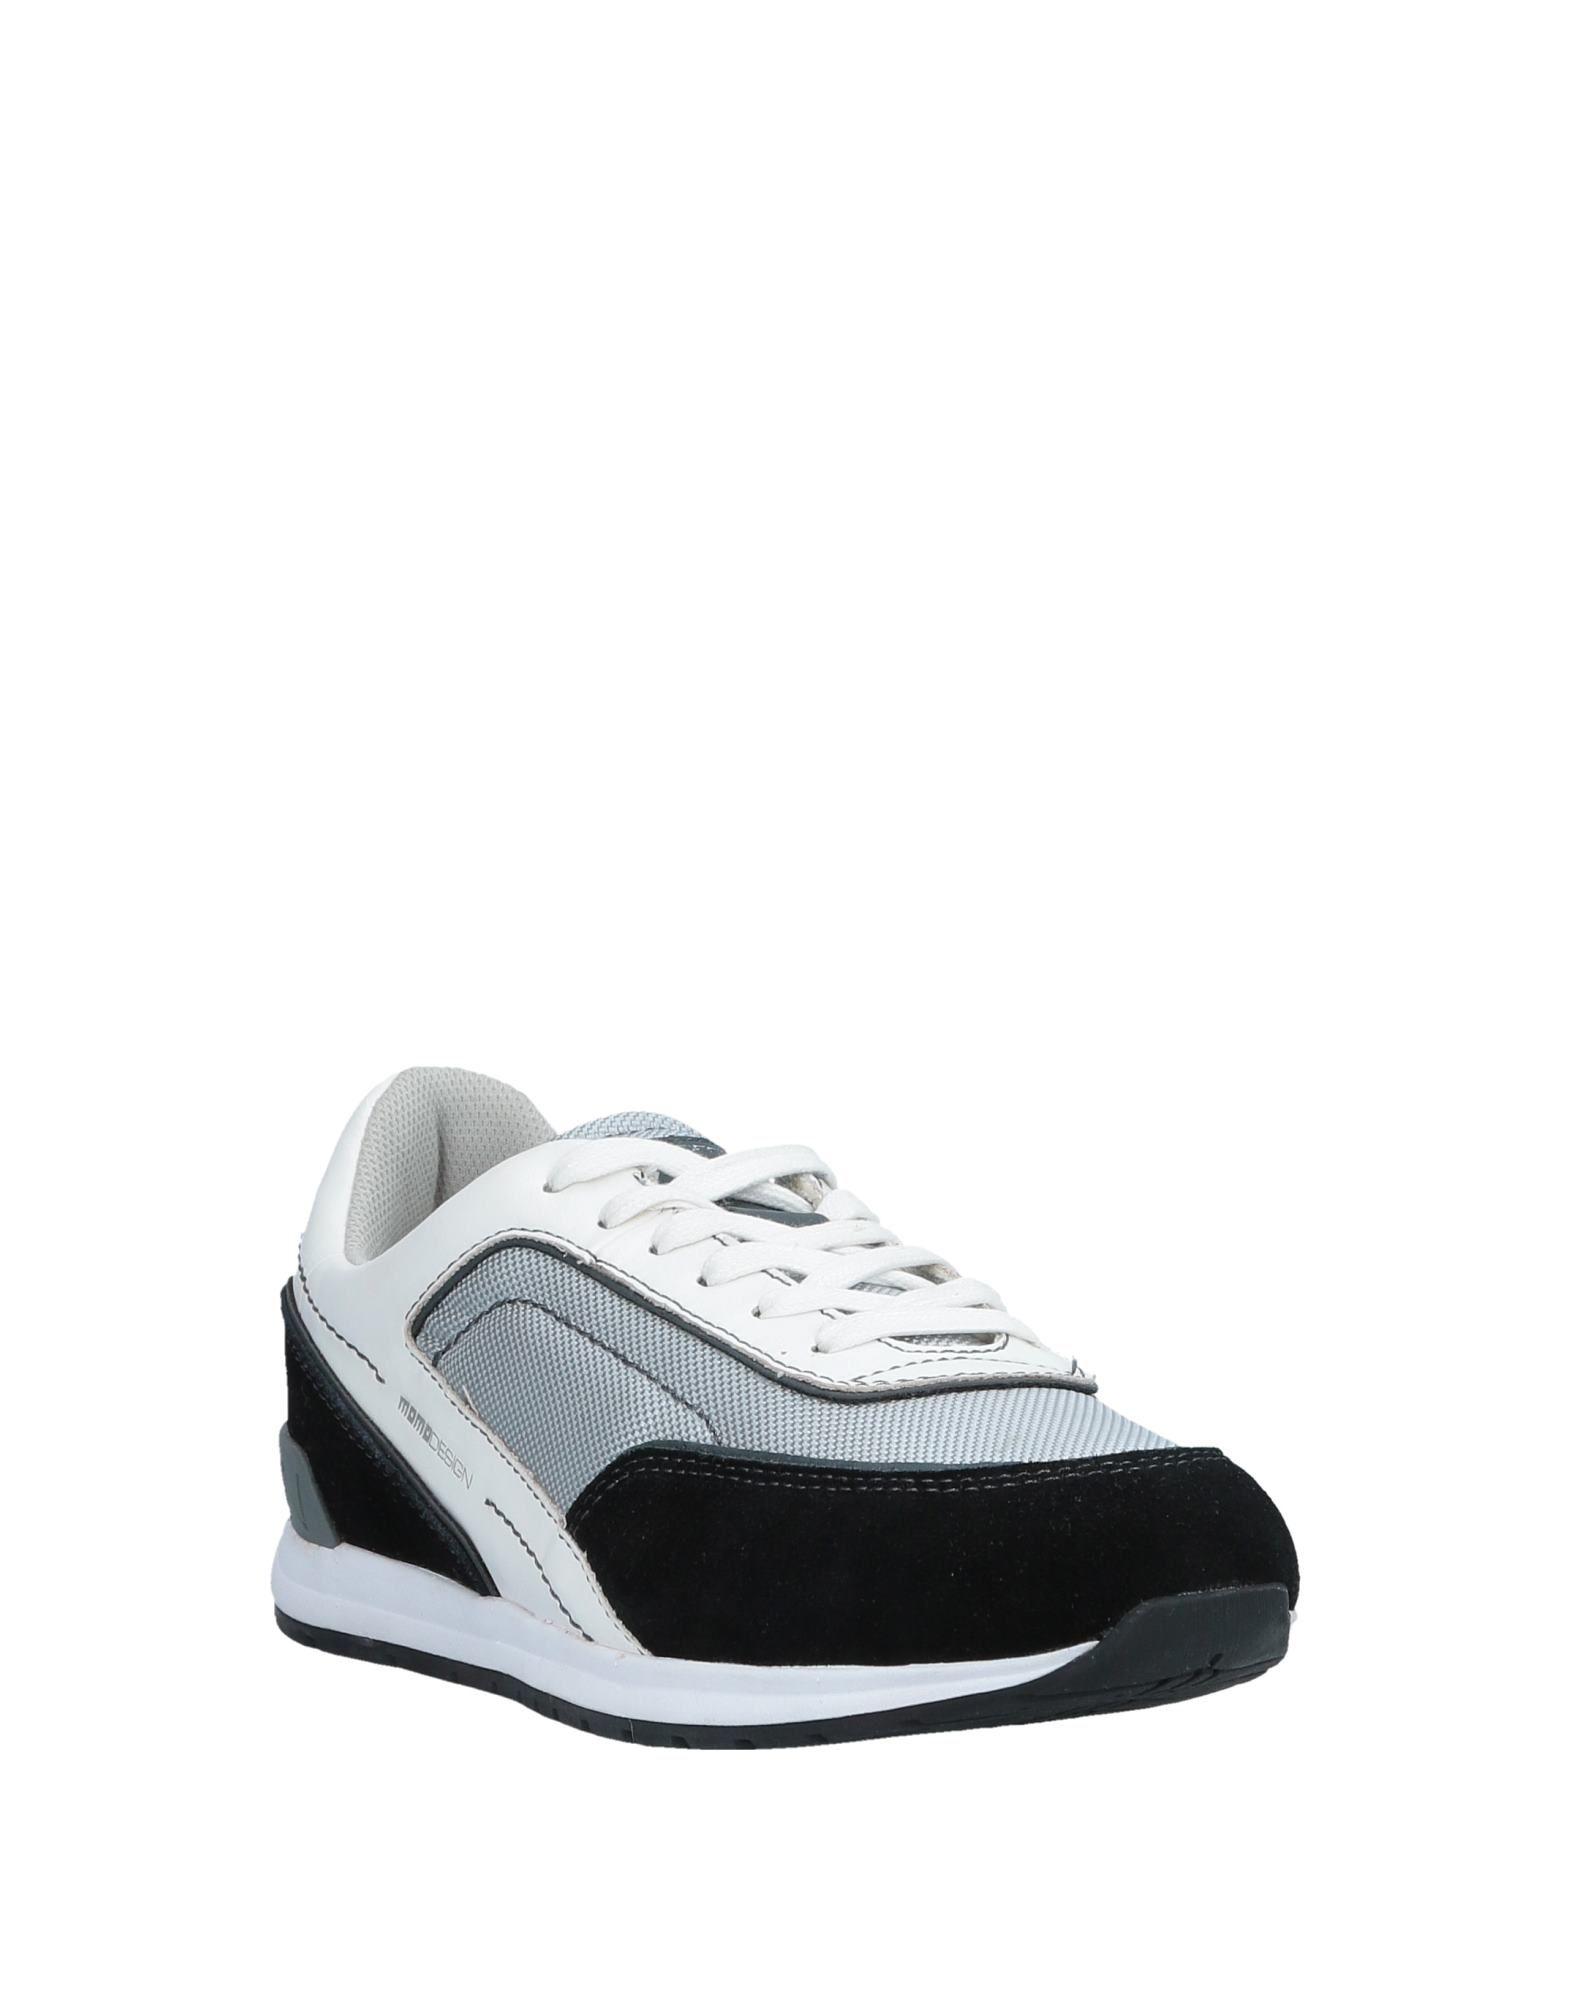 Momo Design Sneakers - Men Momo Momo Momo Design Sneakers online on  United Kingdom - 11521556LA 4d20da